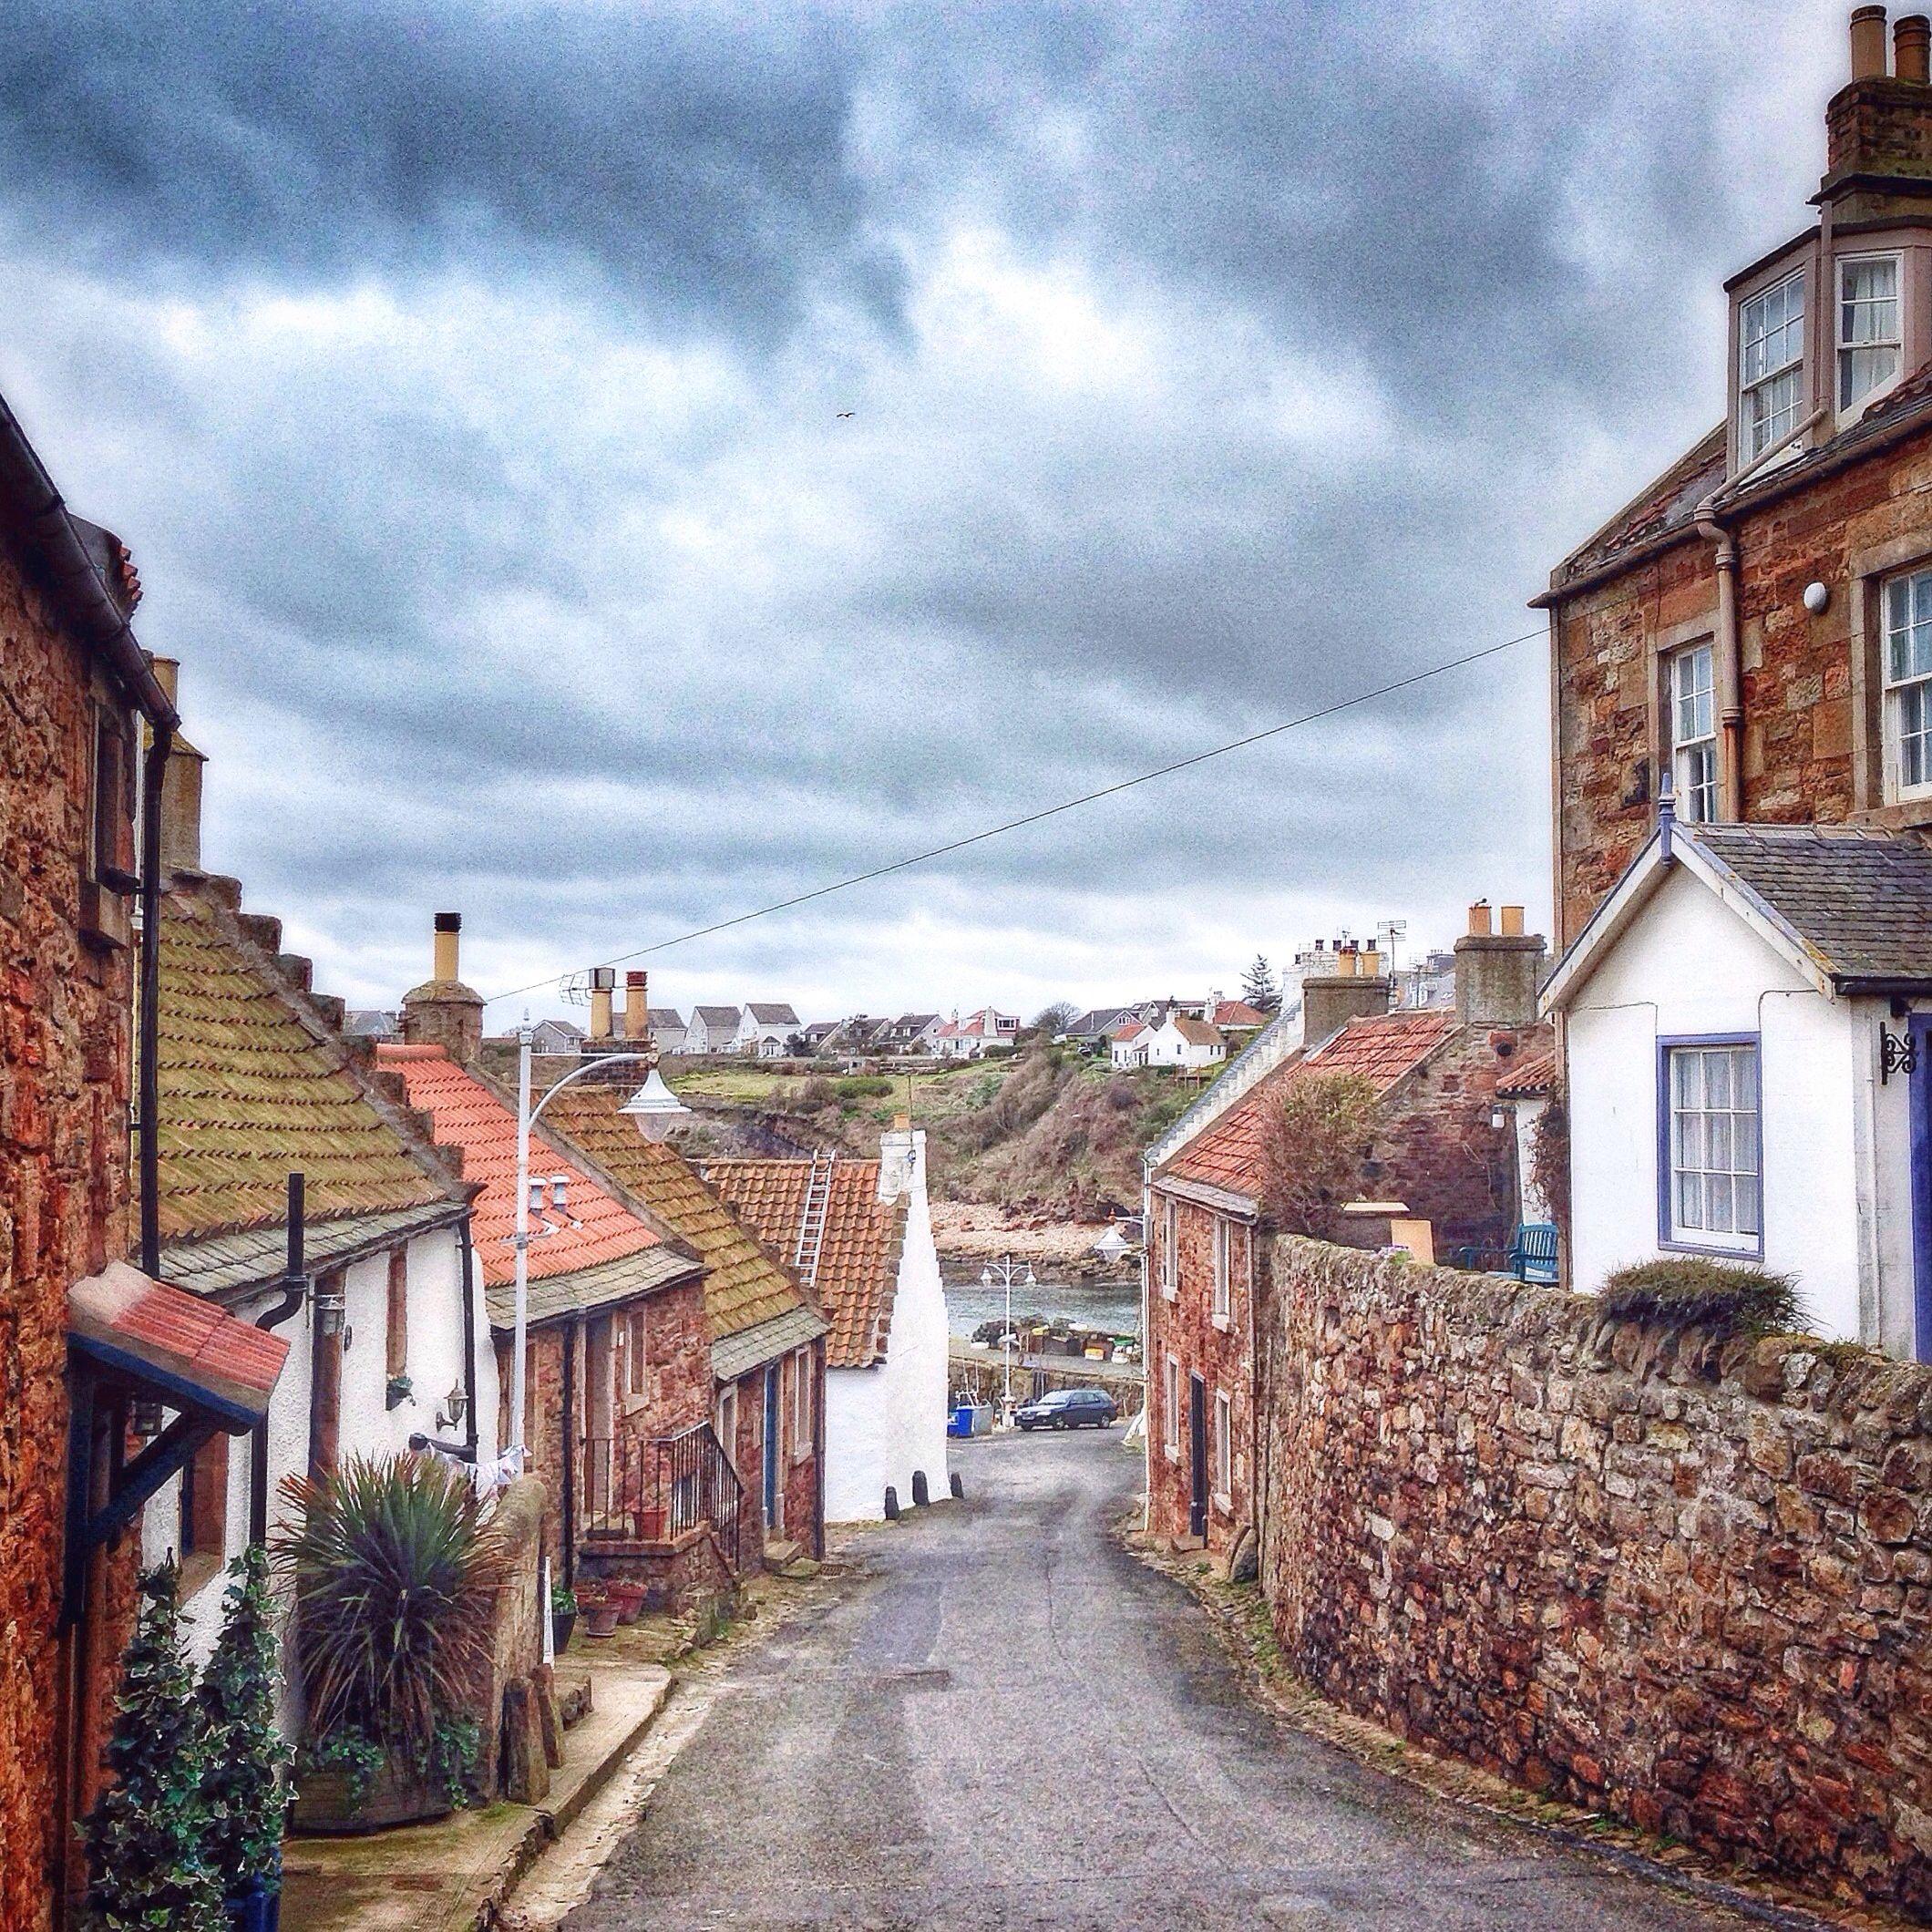 Crail Fife Scotland A Beautiful Charming Fishing Village On The East Coast Scotland